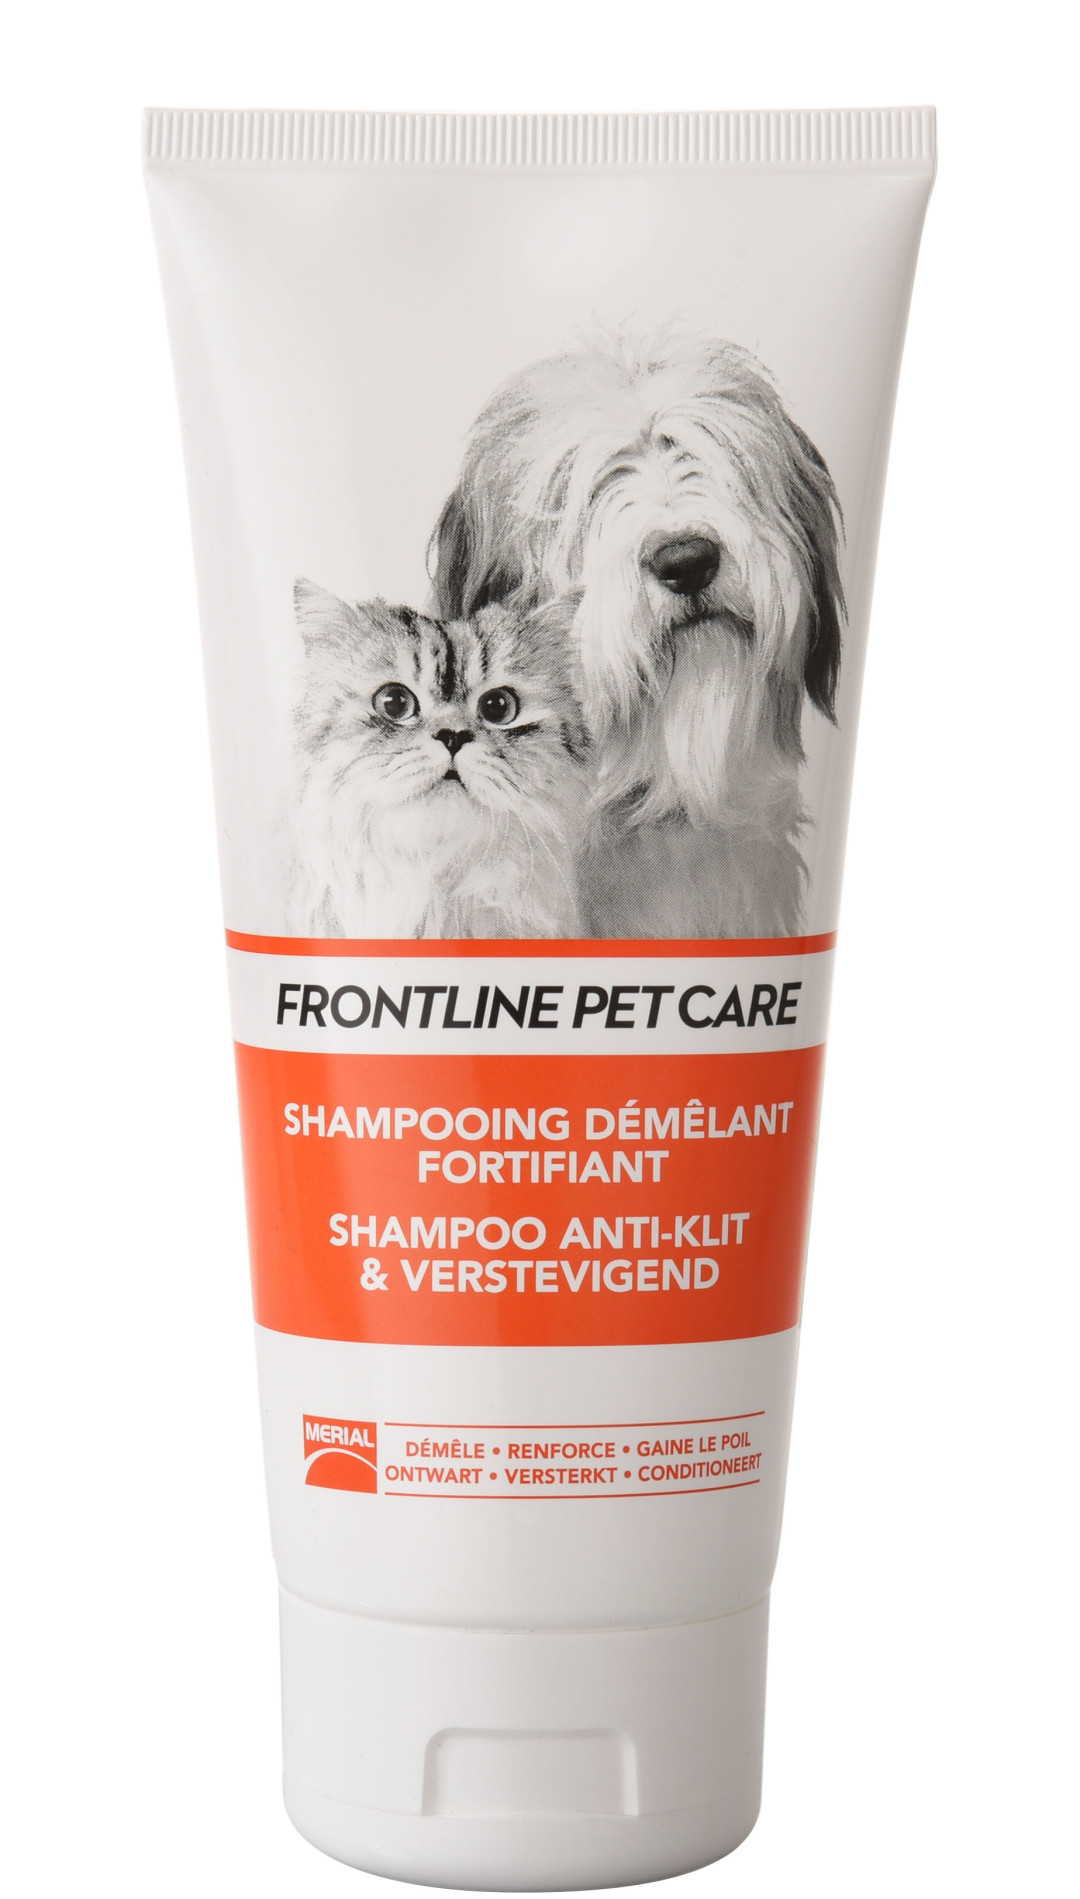 Frontline Pet Care shampoo Anti-Klit & Verstevigend 200 ml